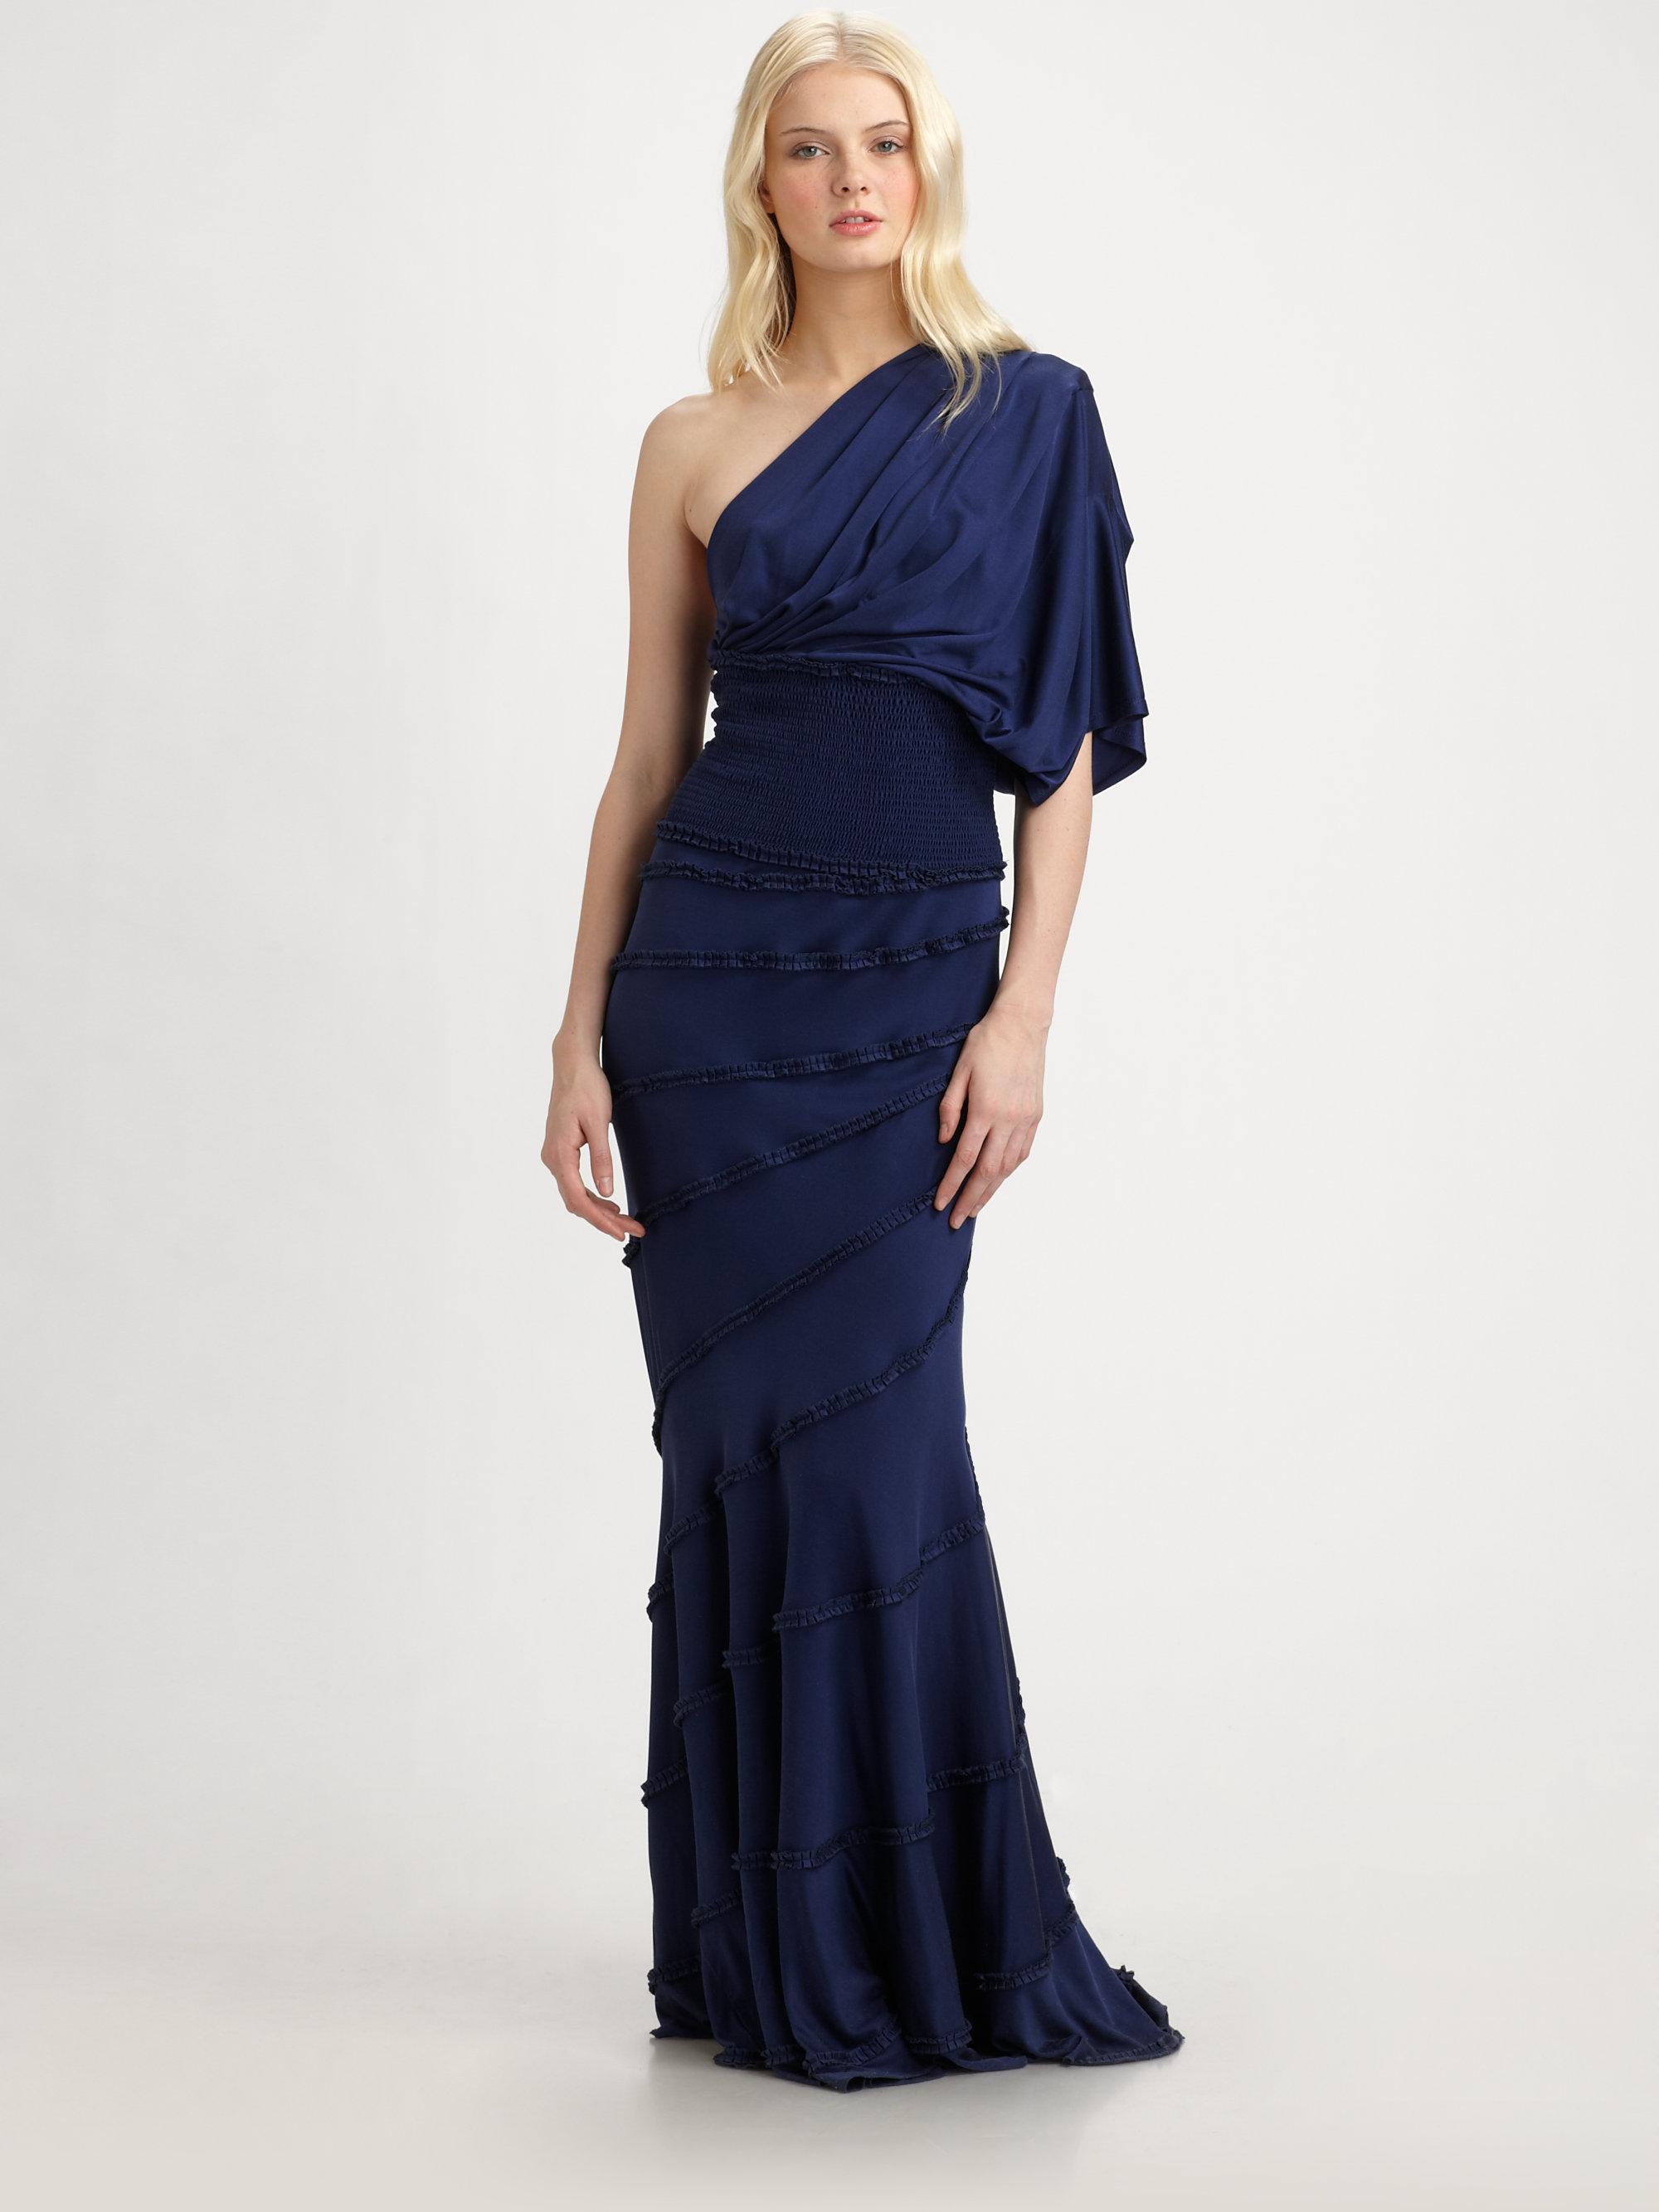 Catherine Malandrino Evening Dresses